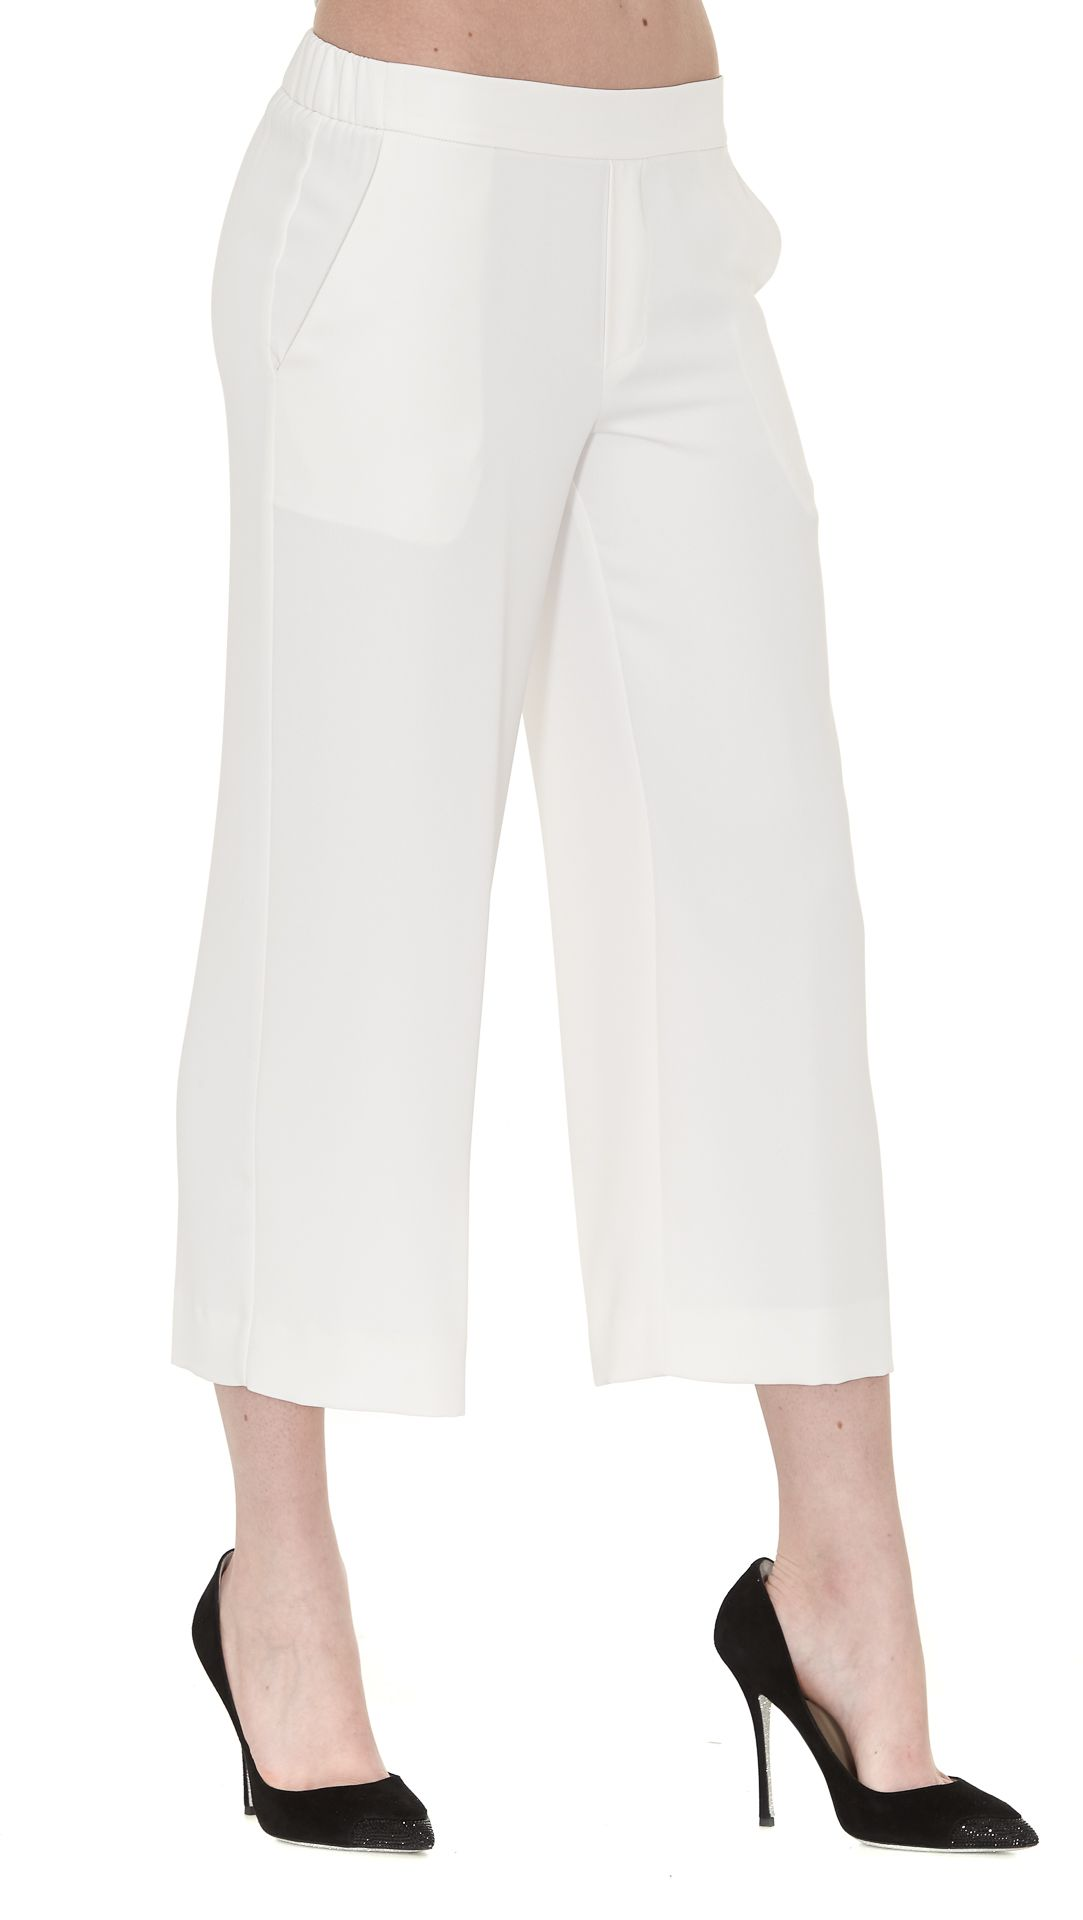 Parosh Pantery Trousers